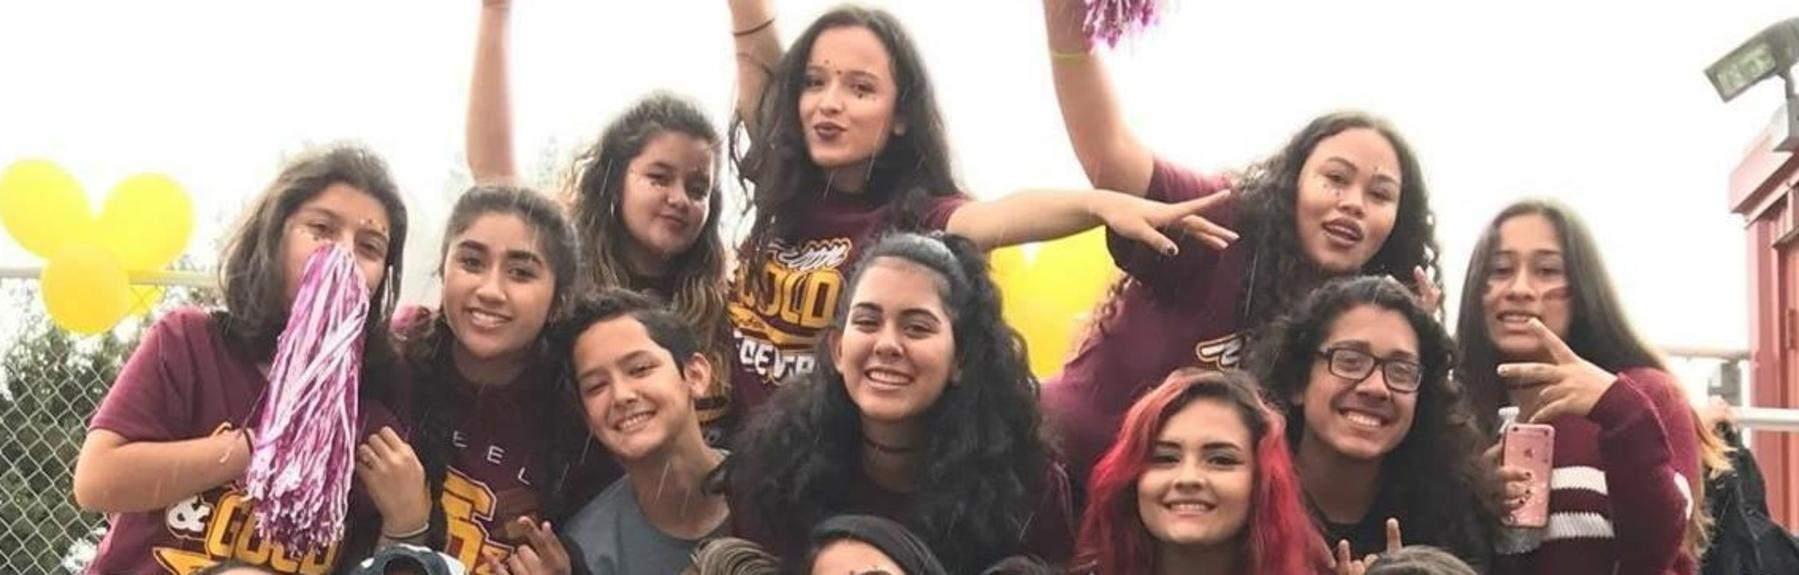 SLZ students showing school pride